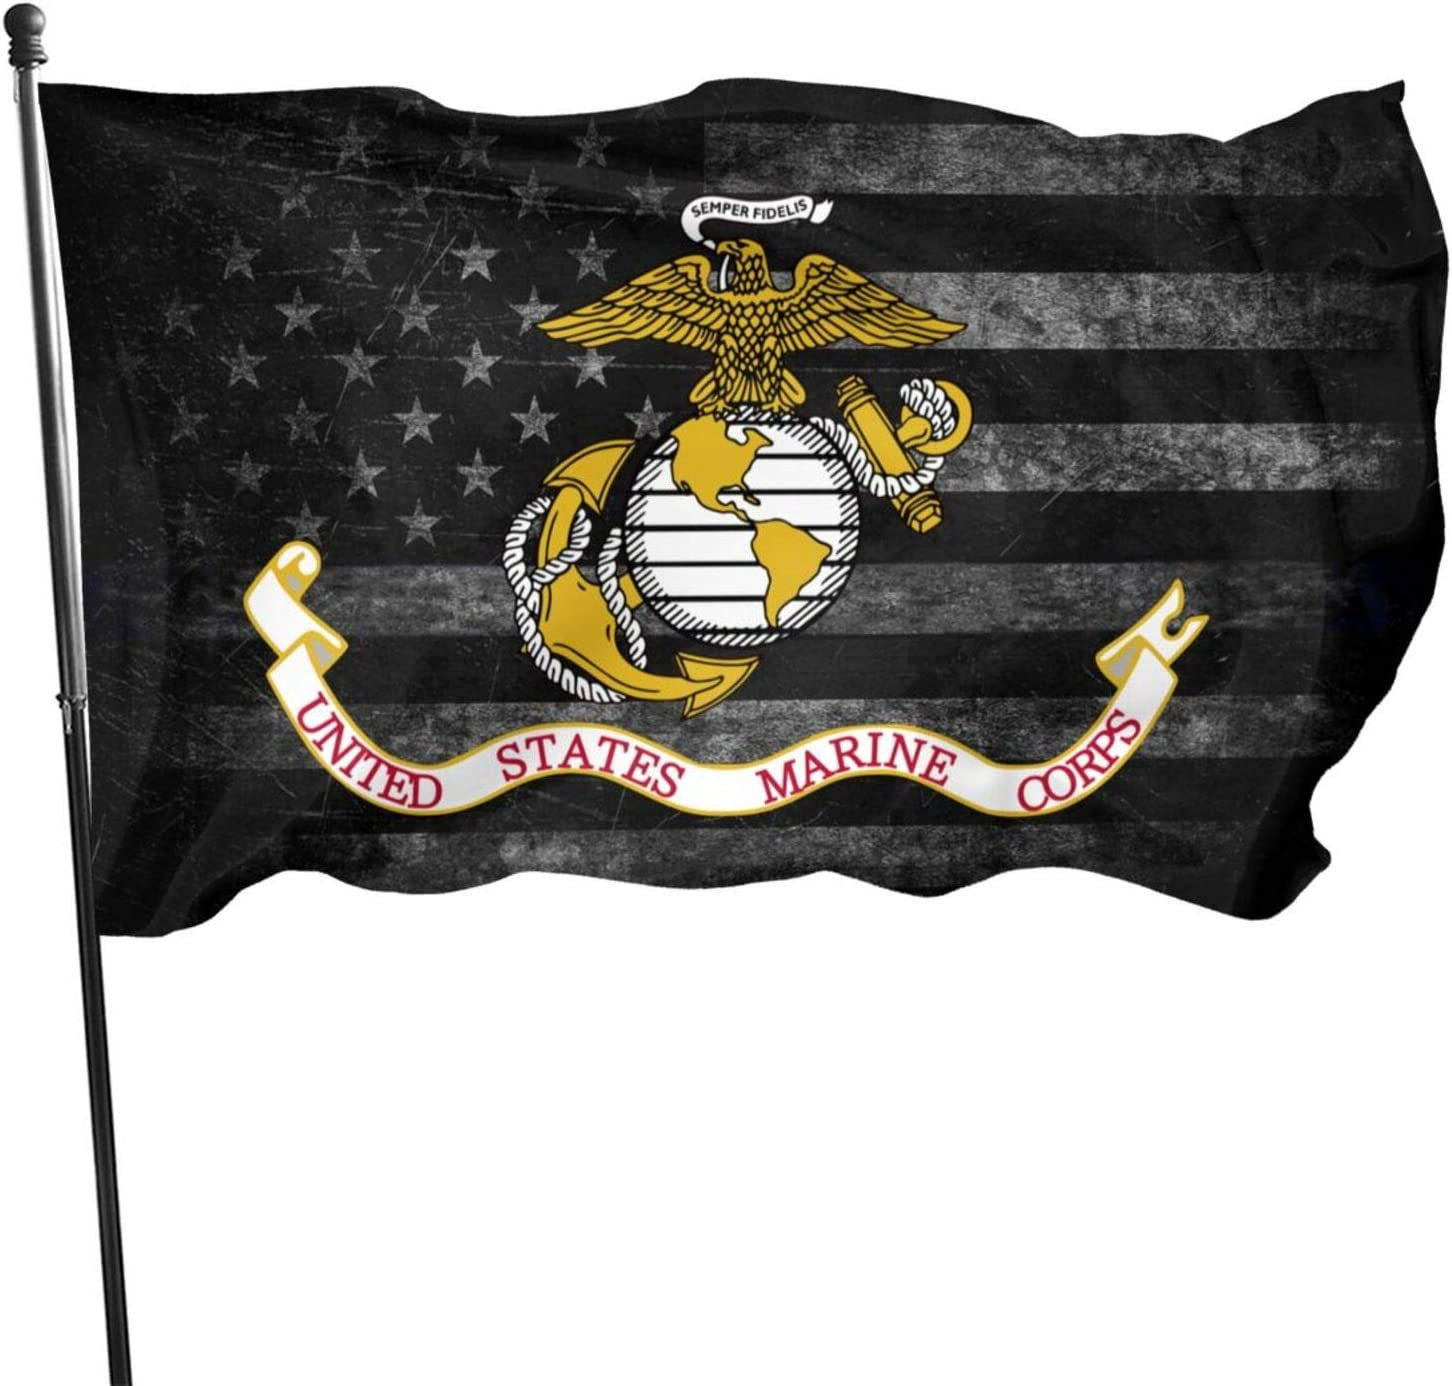 KOUSHANAIER US Marine Corps Flag 3 x 5 Ft - USMC Veteran Flags with Grommets - Banner Breeze Flag 3X5 Foot Outdoor Decor